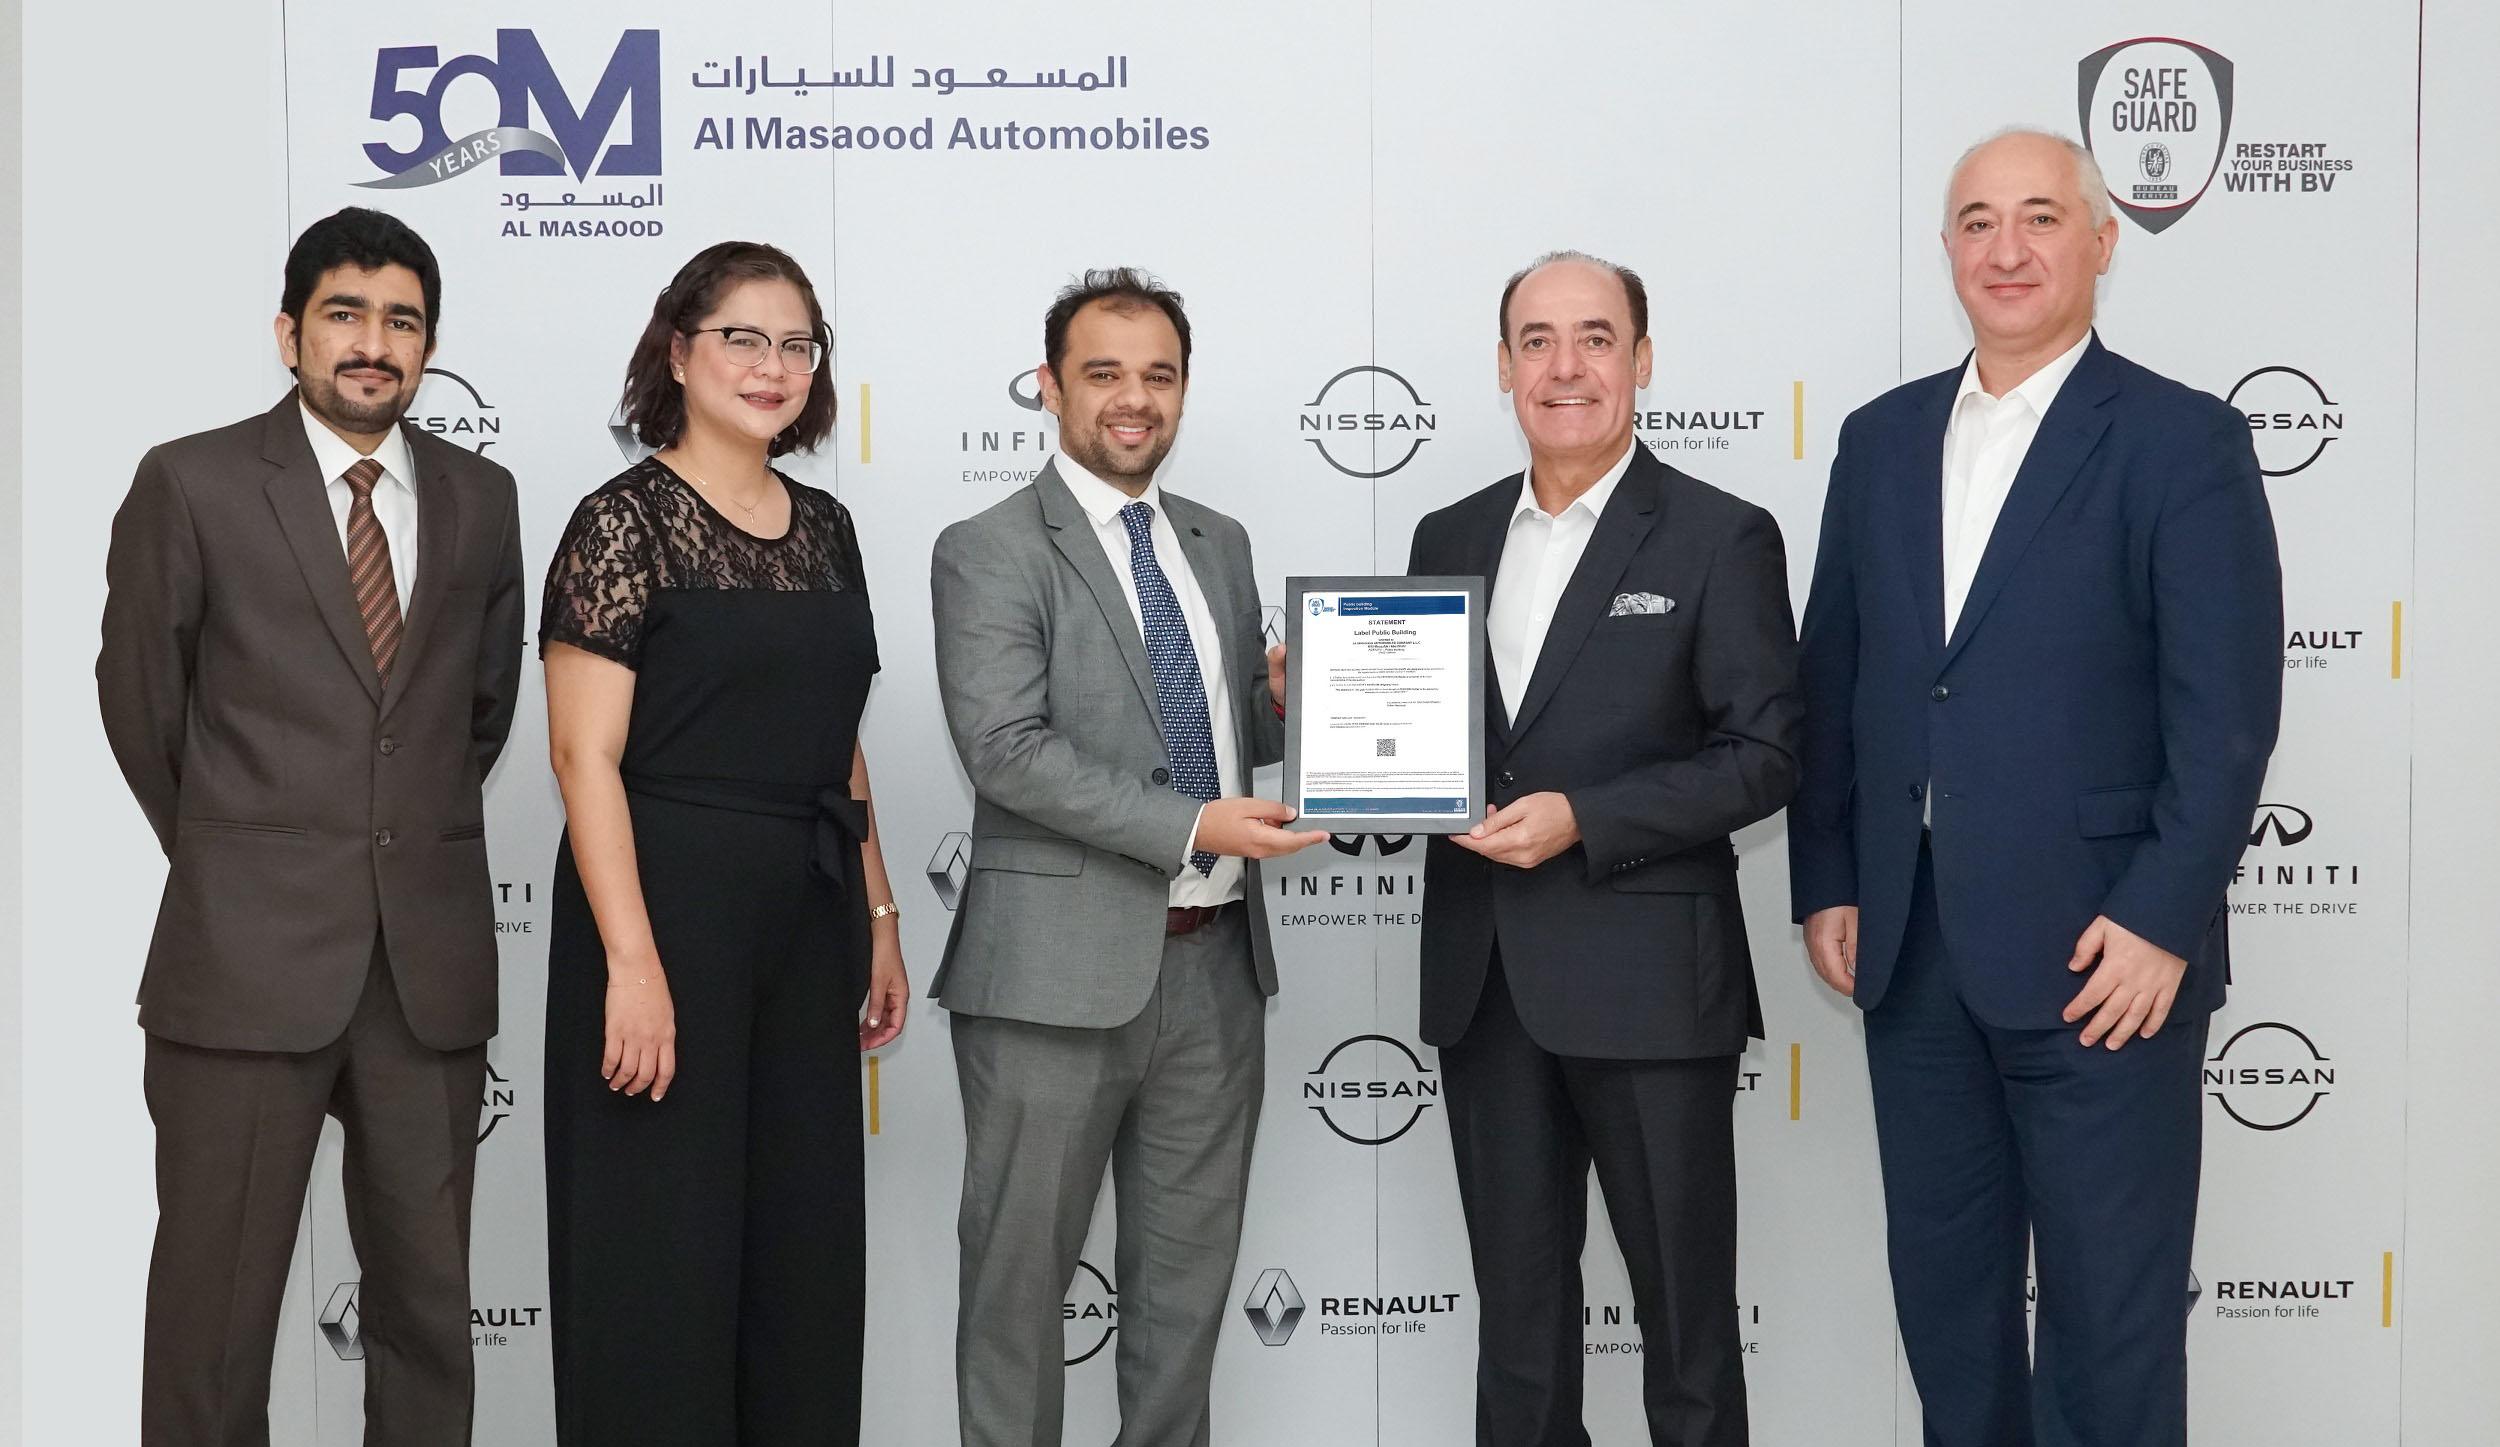 Al Masaood Automobiles Becomes First Automotive Company to Receive Bureau Veritas' 'Safeguard' Label in GCC